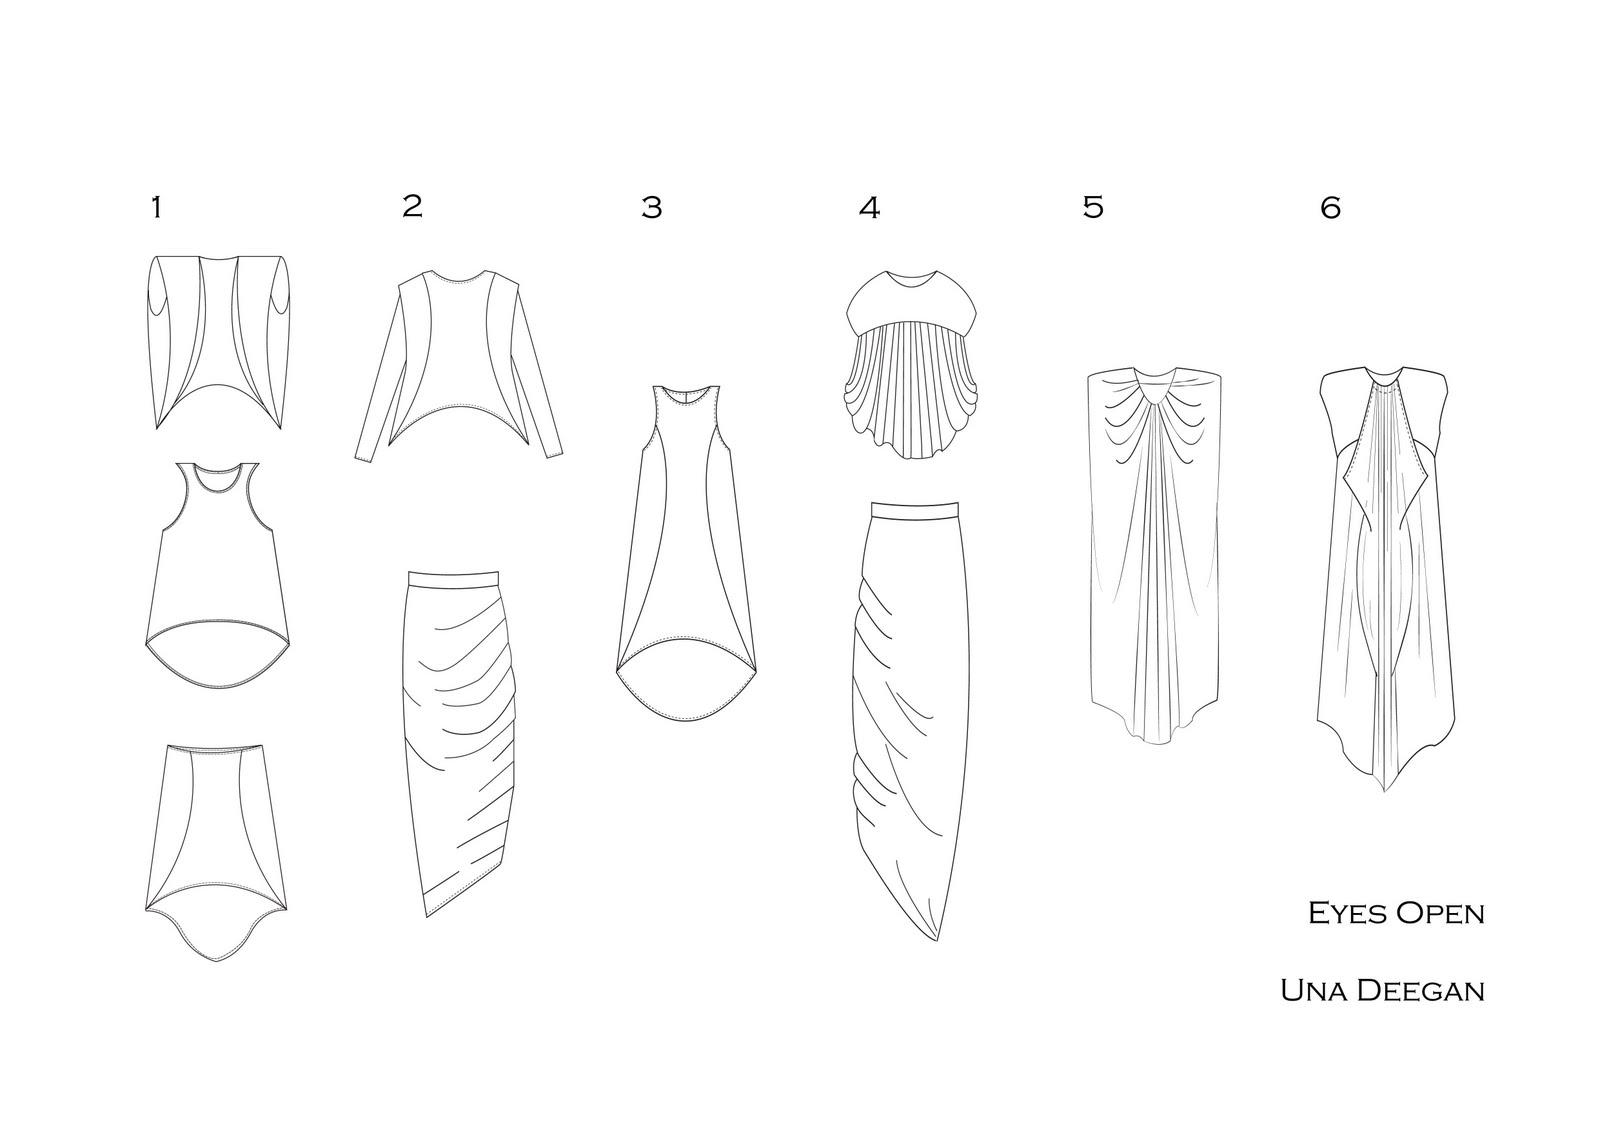 LSAD fashion graduates: Una Deegan